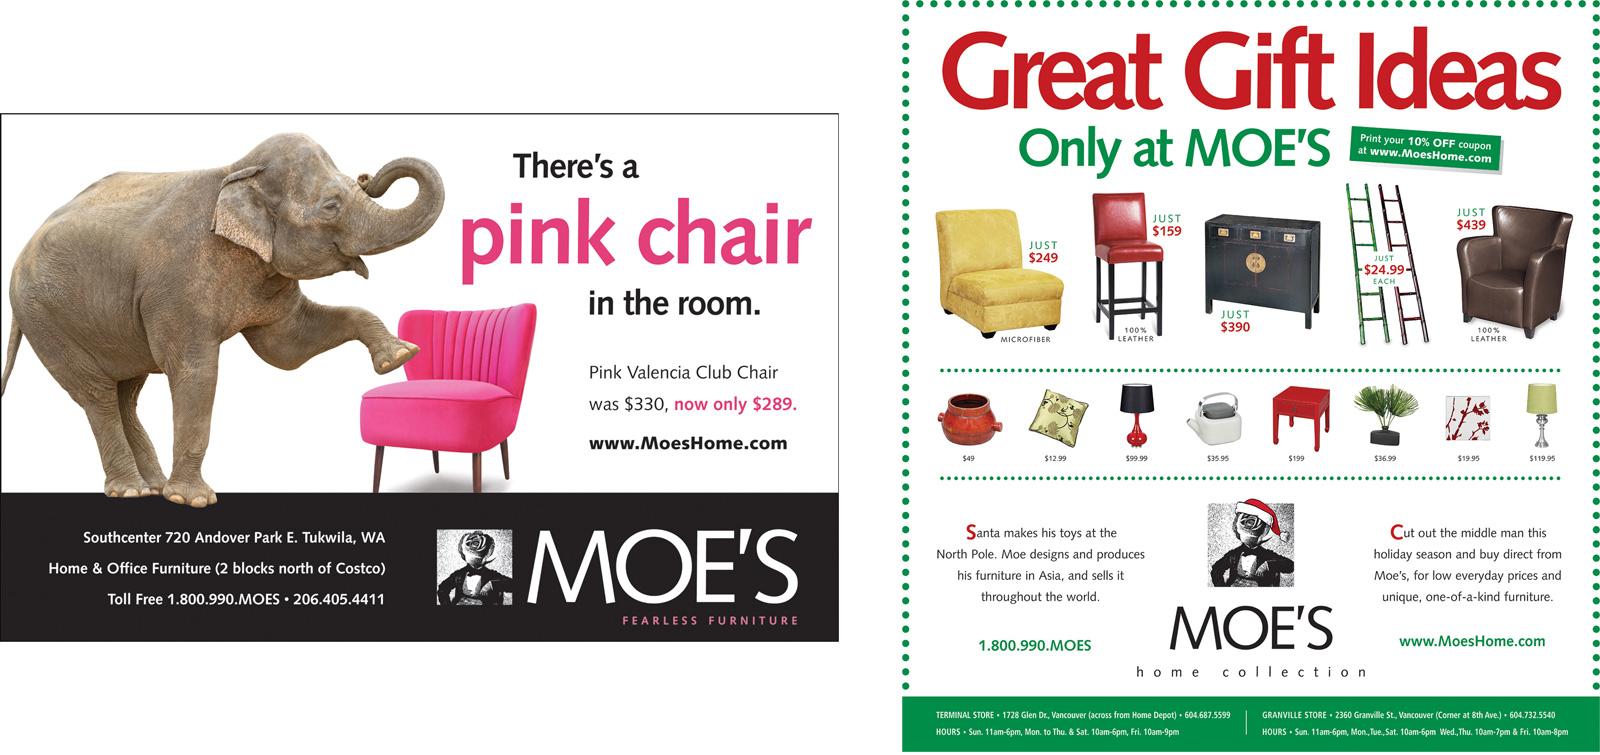 retail-furniture-print-ads.jpg